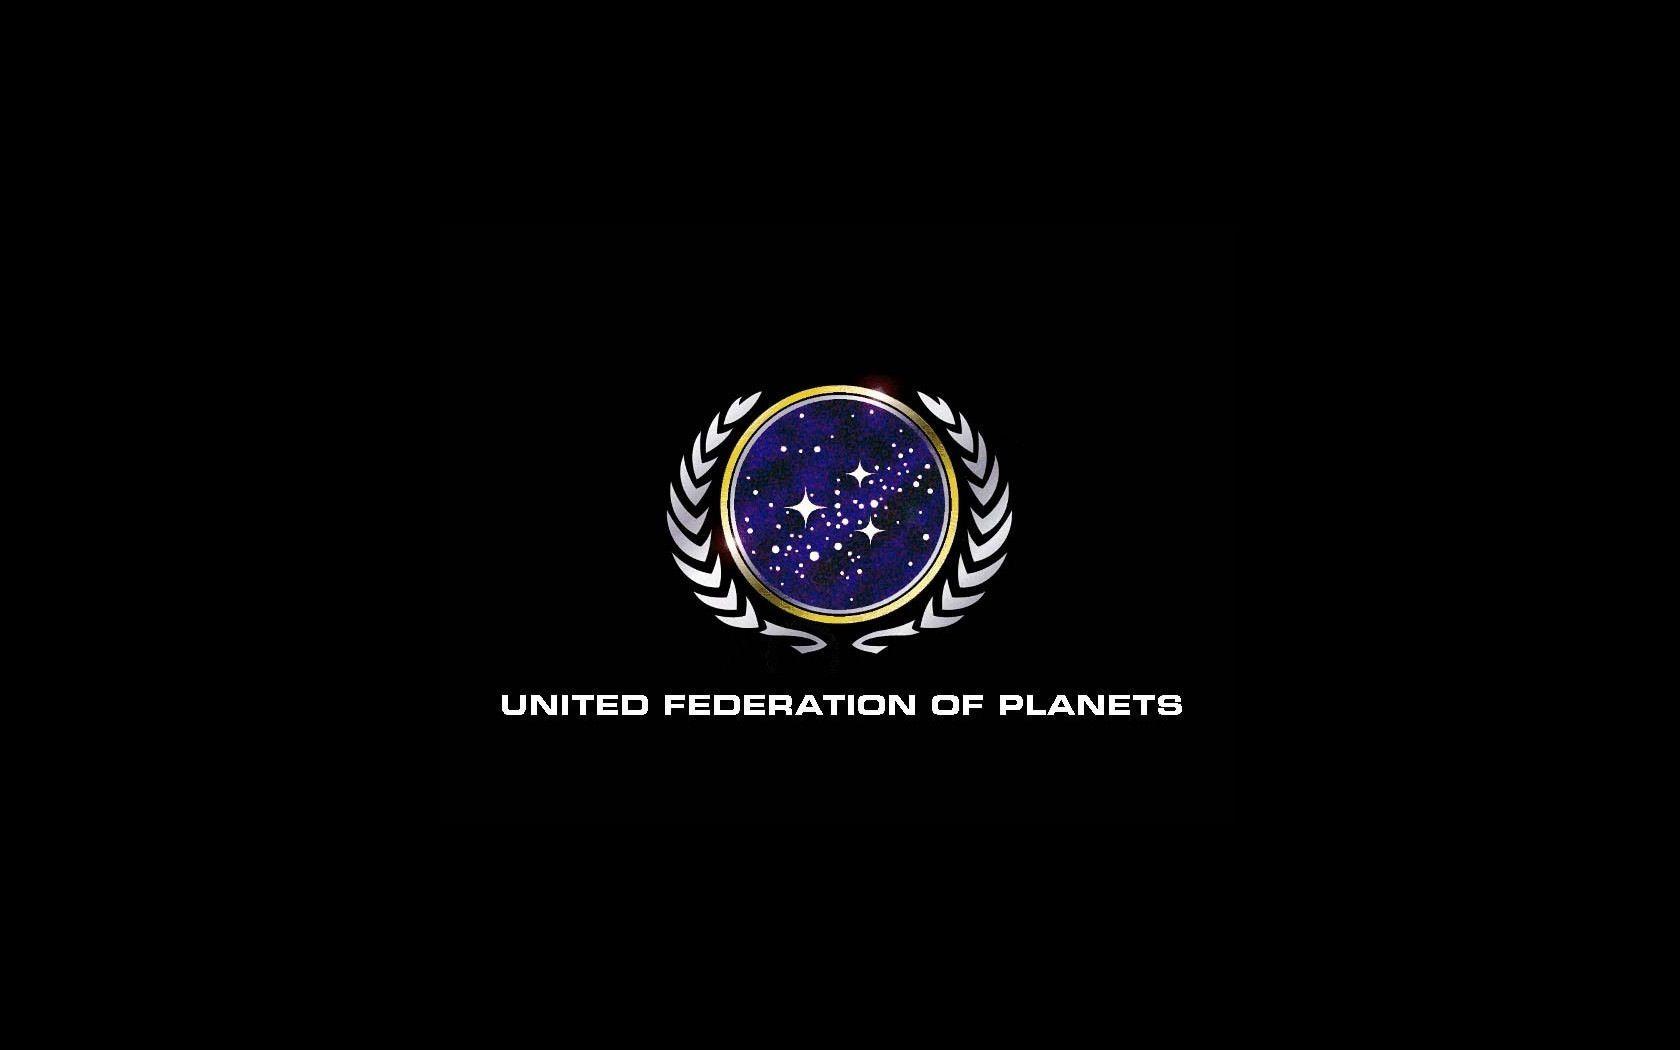 united federation of planets emblem - photo #15